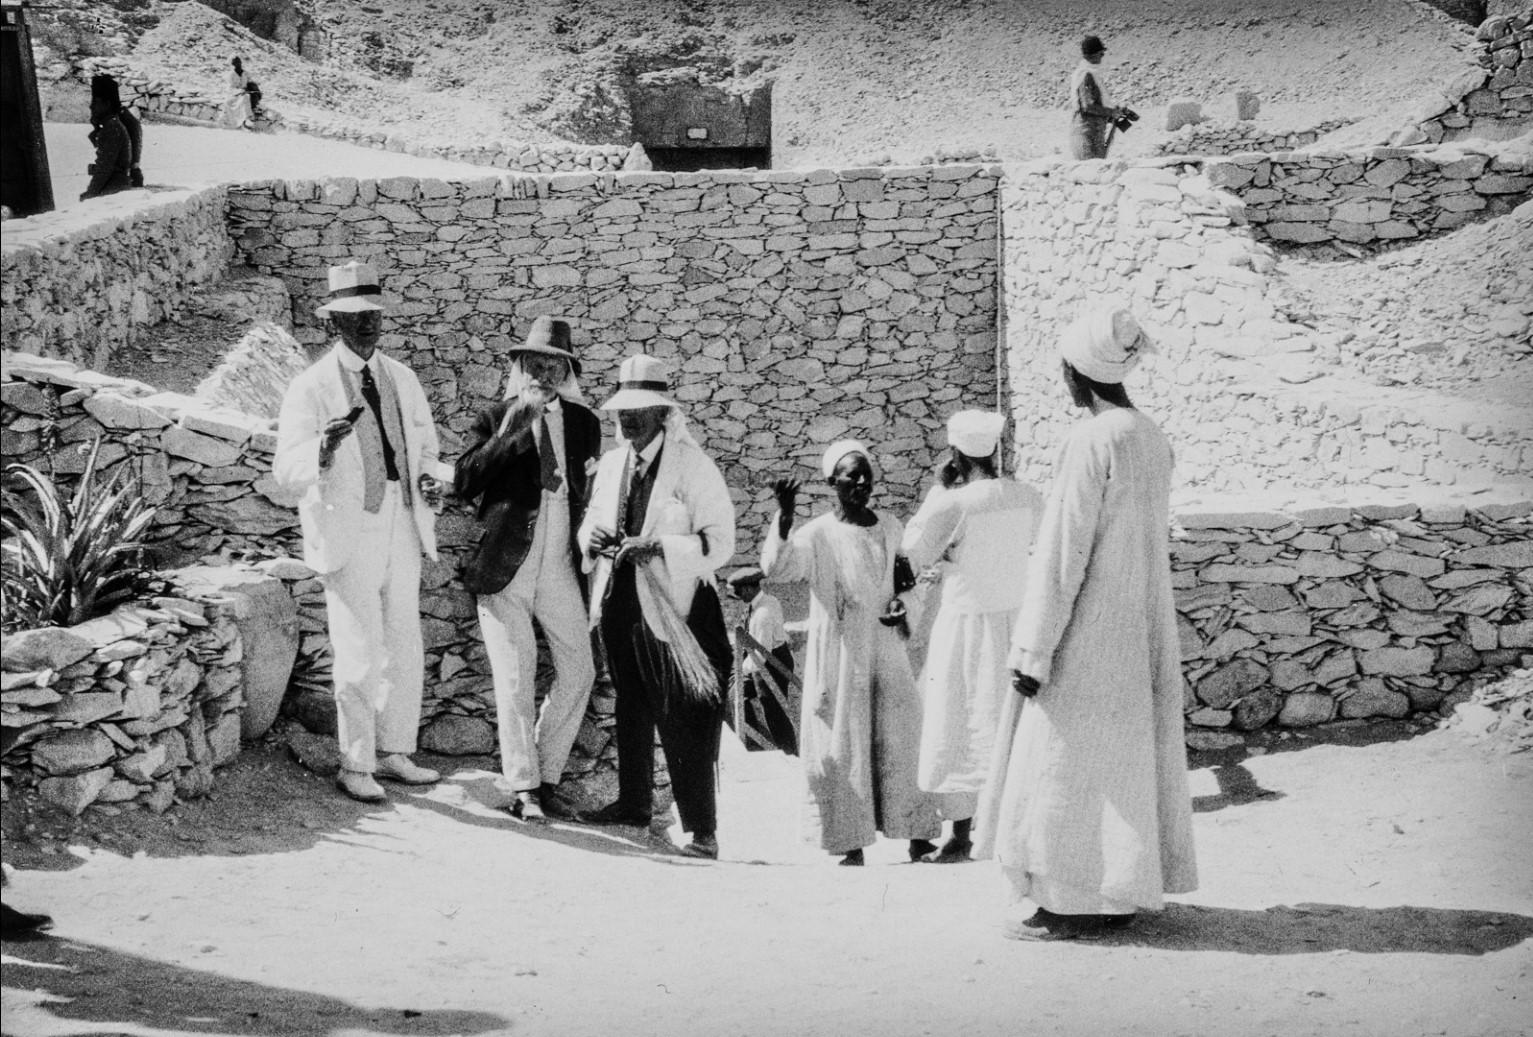 Группа мужчин перед входом в гробницу Тутанхамона